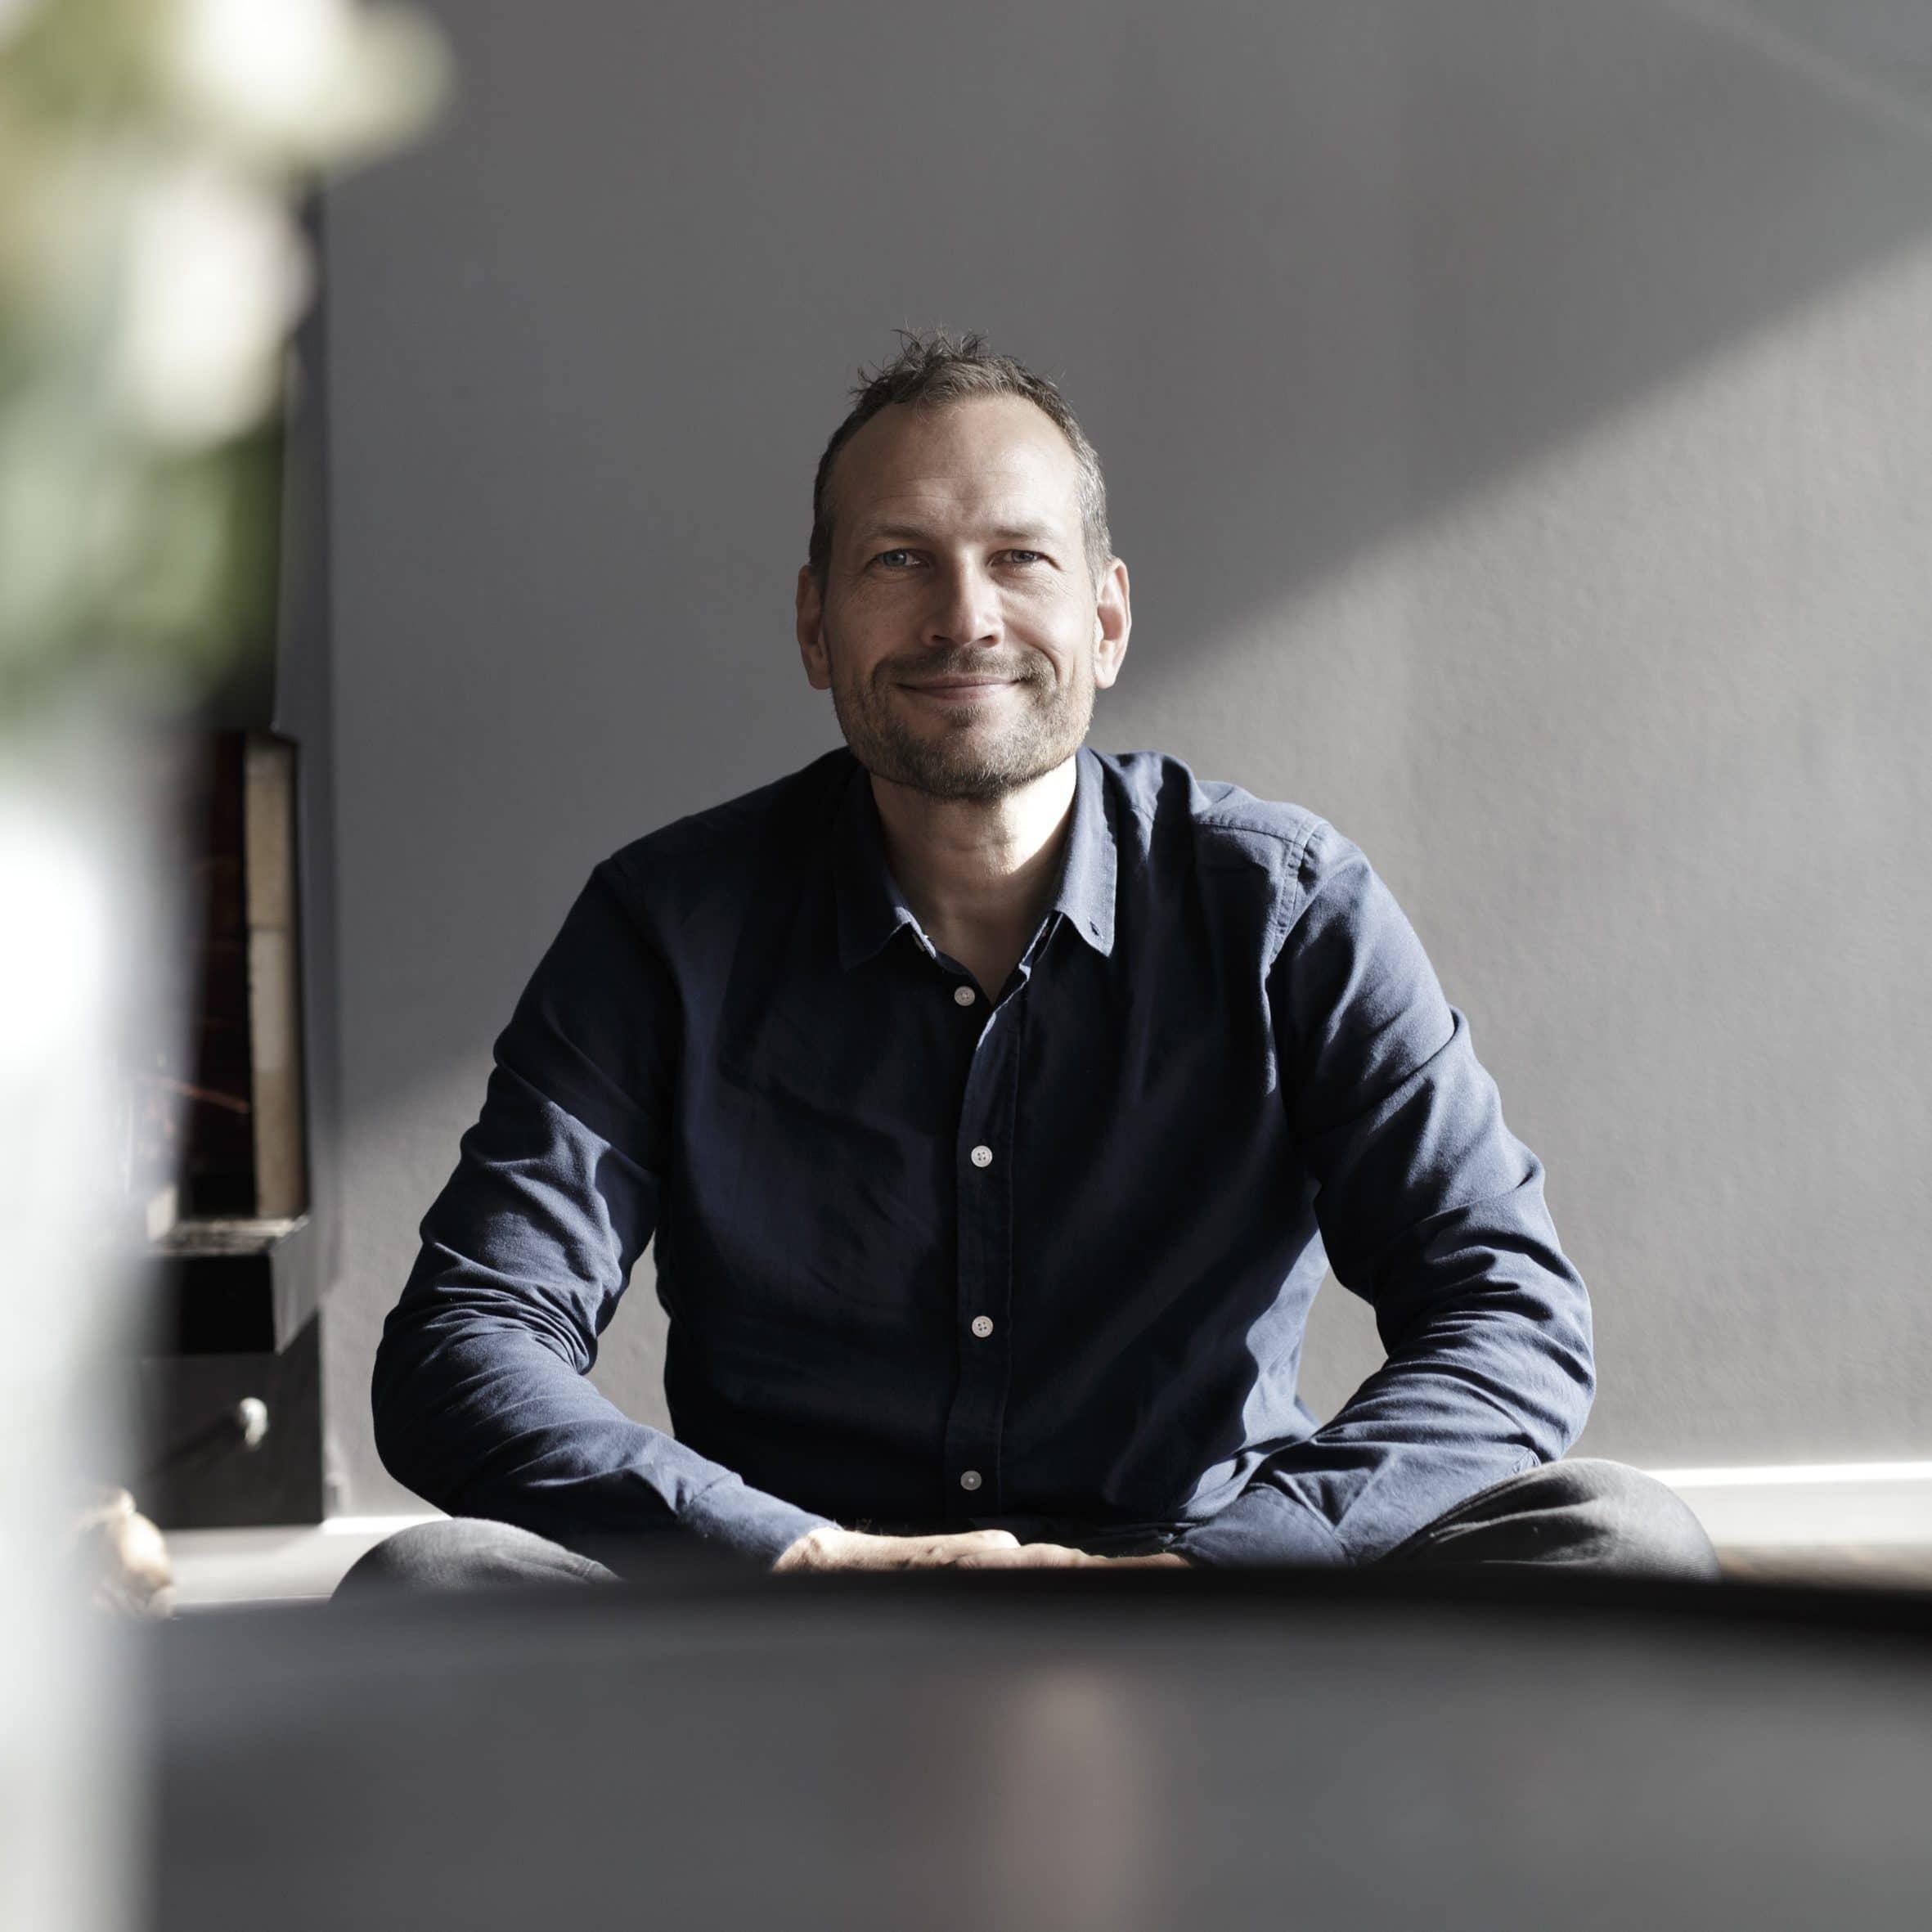 Martin Thorborg smilende